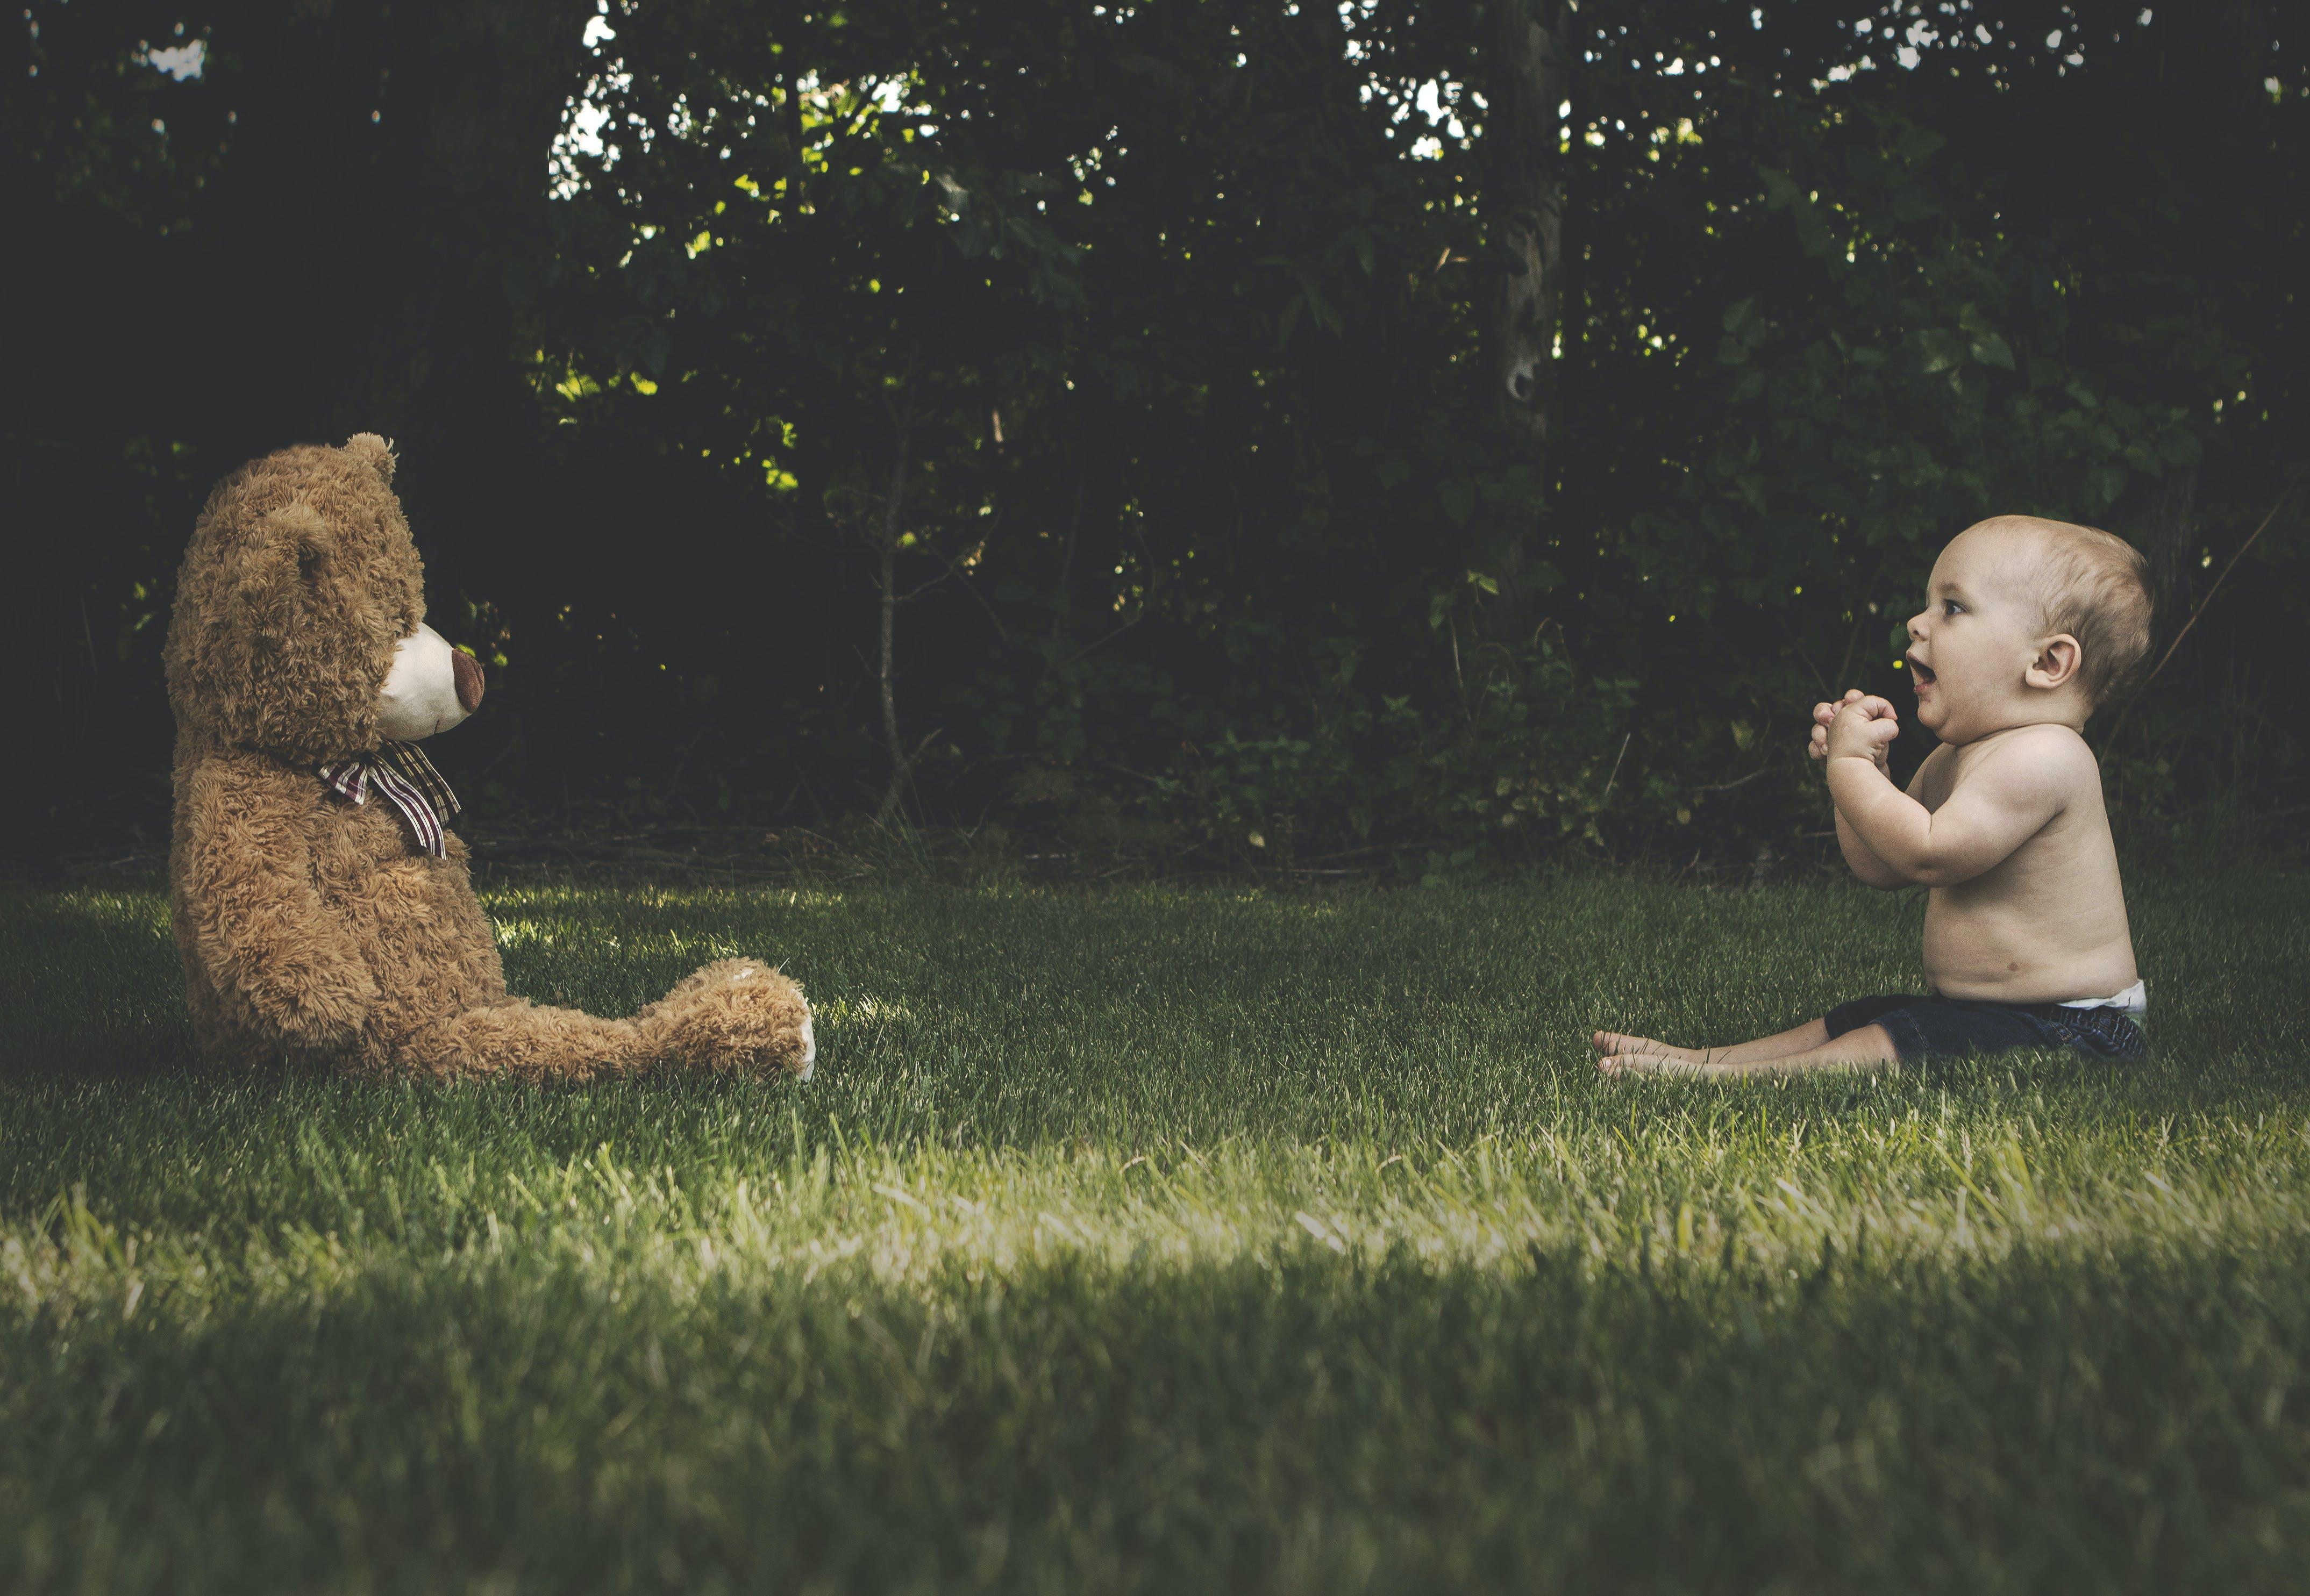 Free stock photo of child, childhood, teddy bear, baby